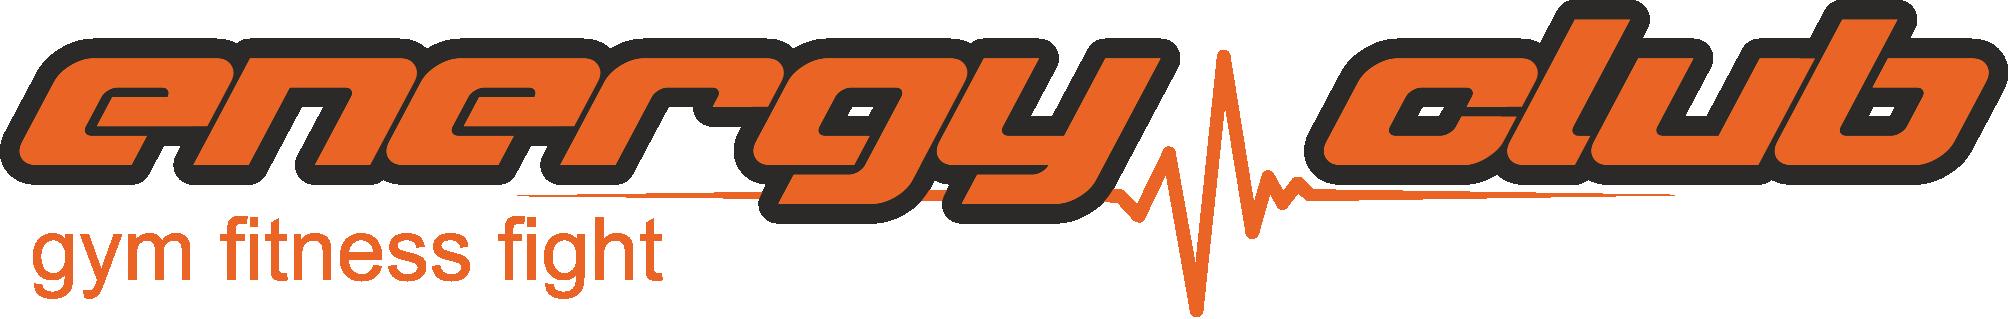 logo-2014-energy-club-orange